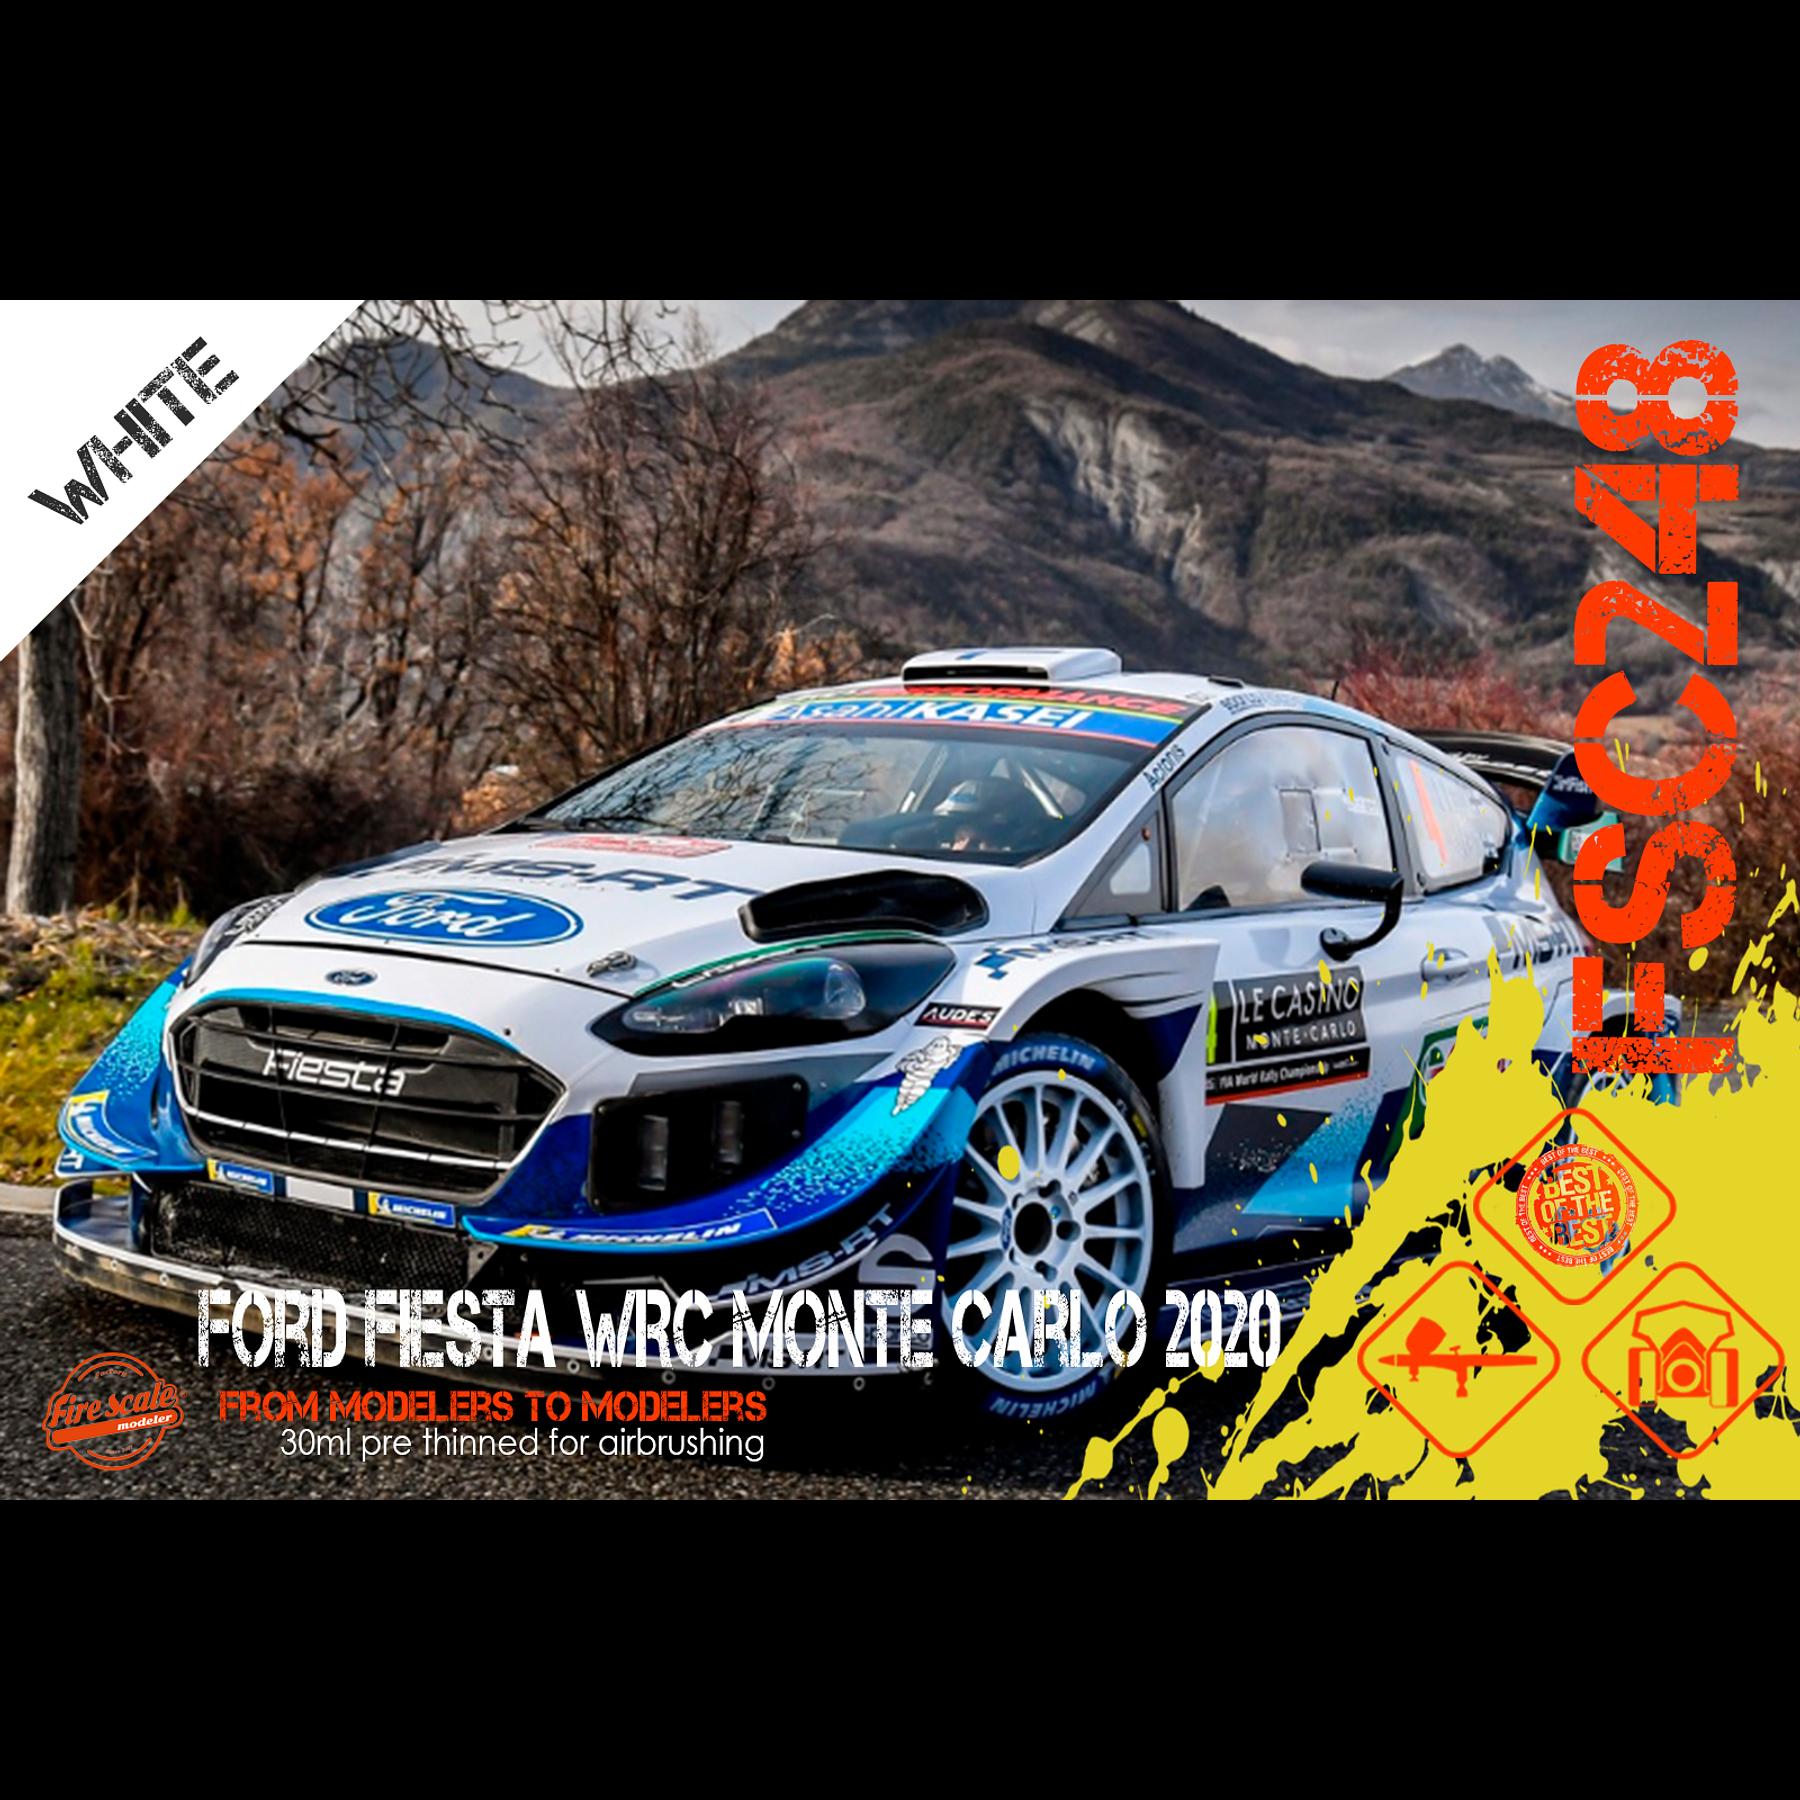 Ford Fiesta WRC Monte Carlo 2020 - Blanco